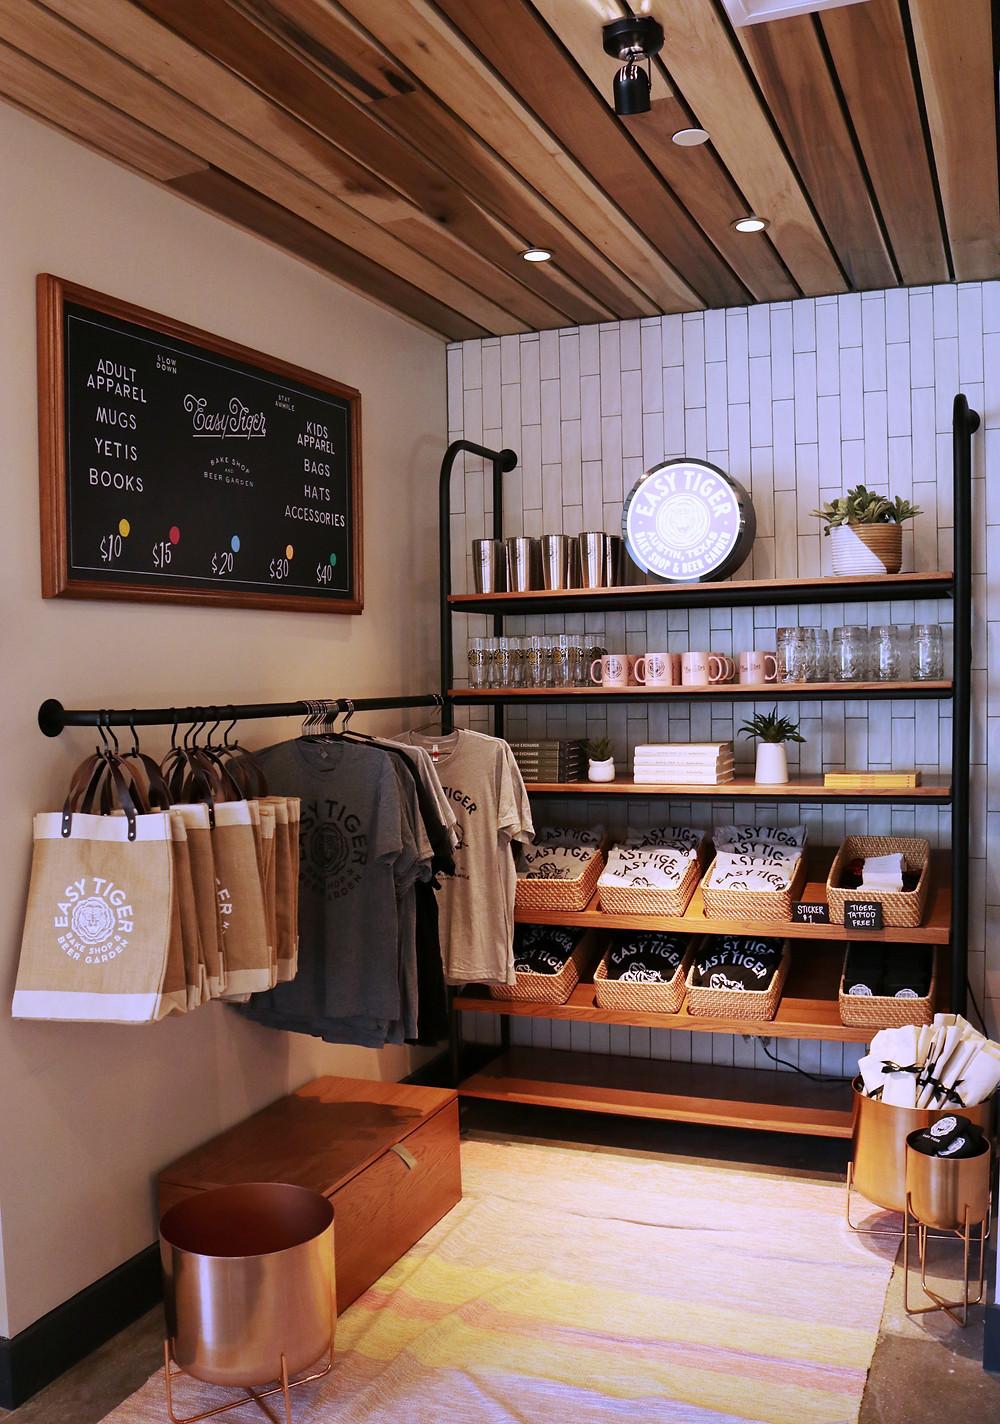 Gift Shop at the Linc